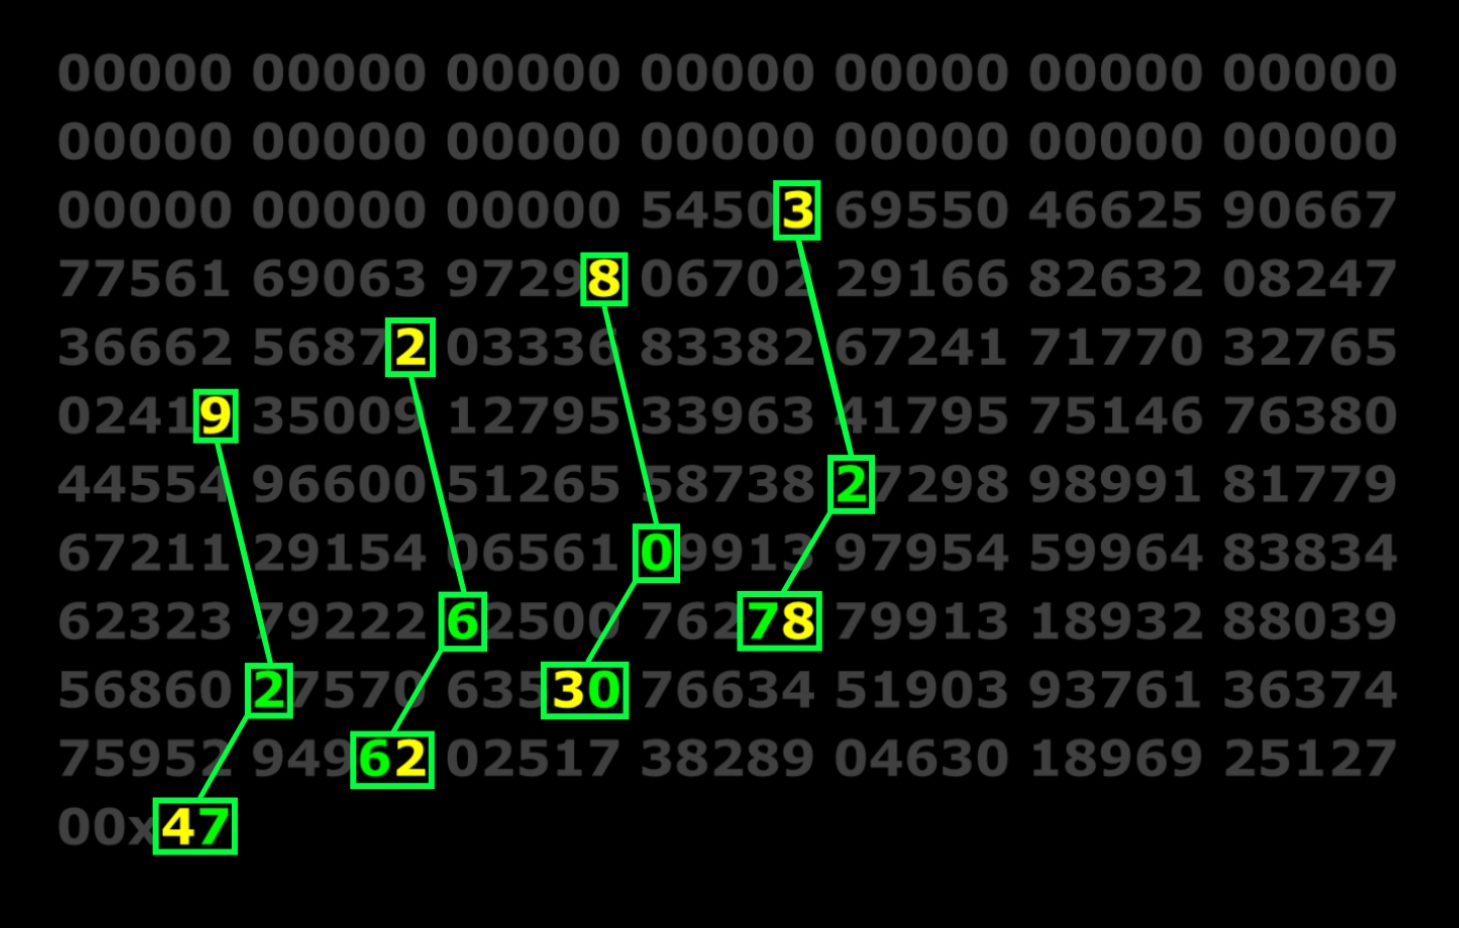 9F7DF594-0571-4731-BA28-93E8FE860DD2.jpeg